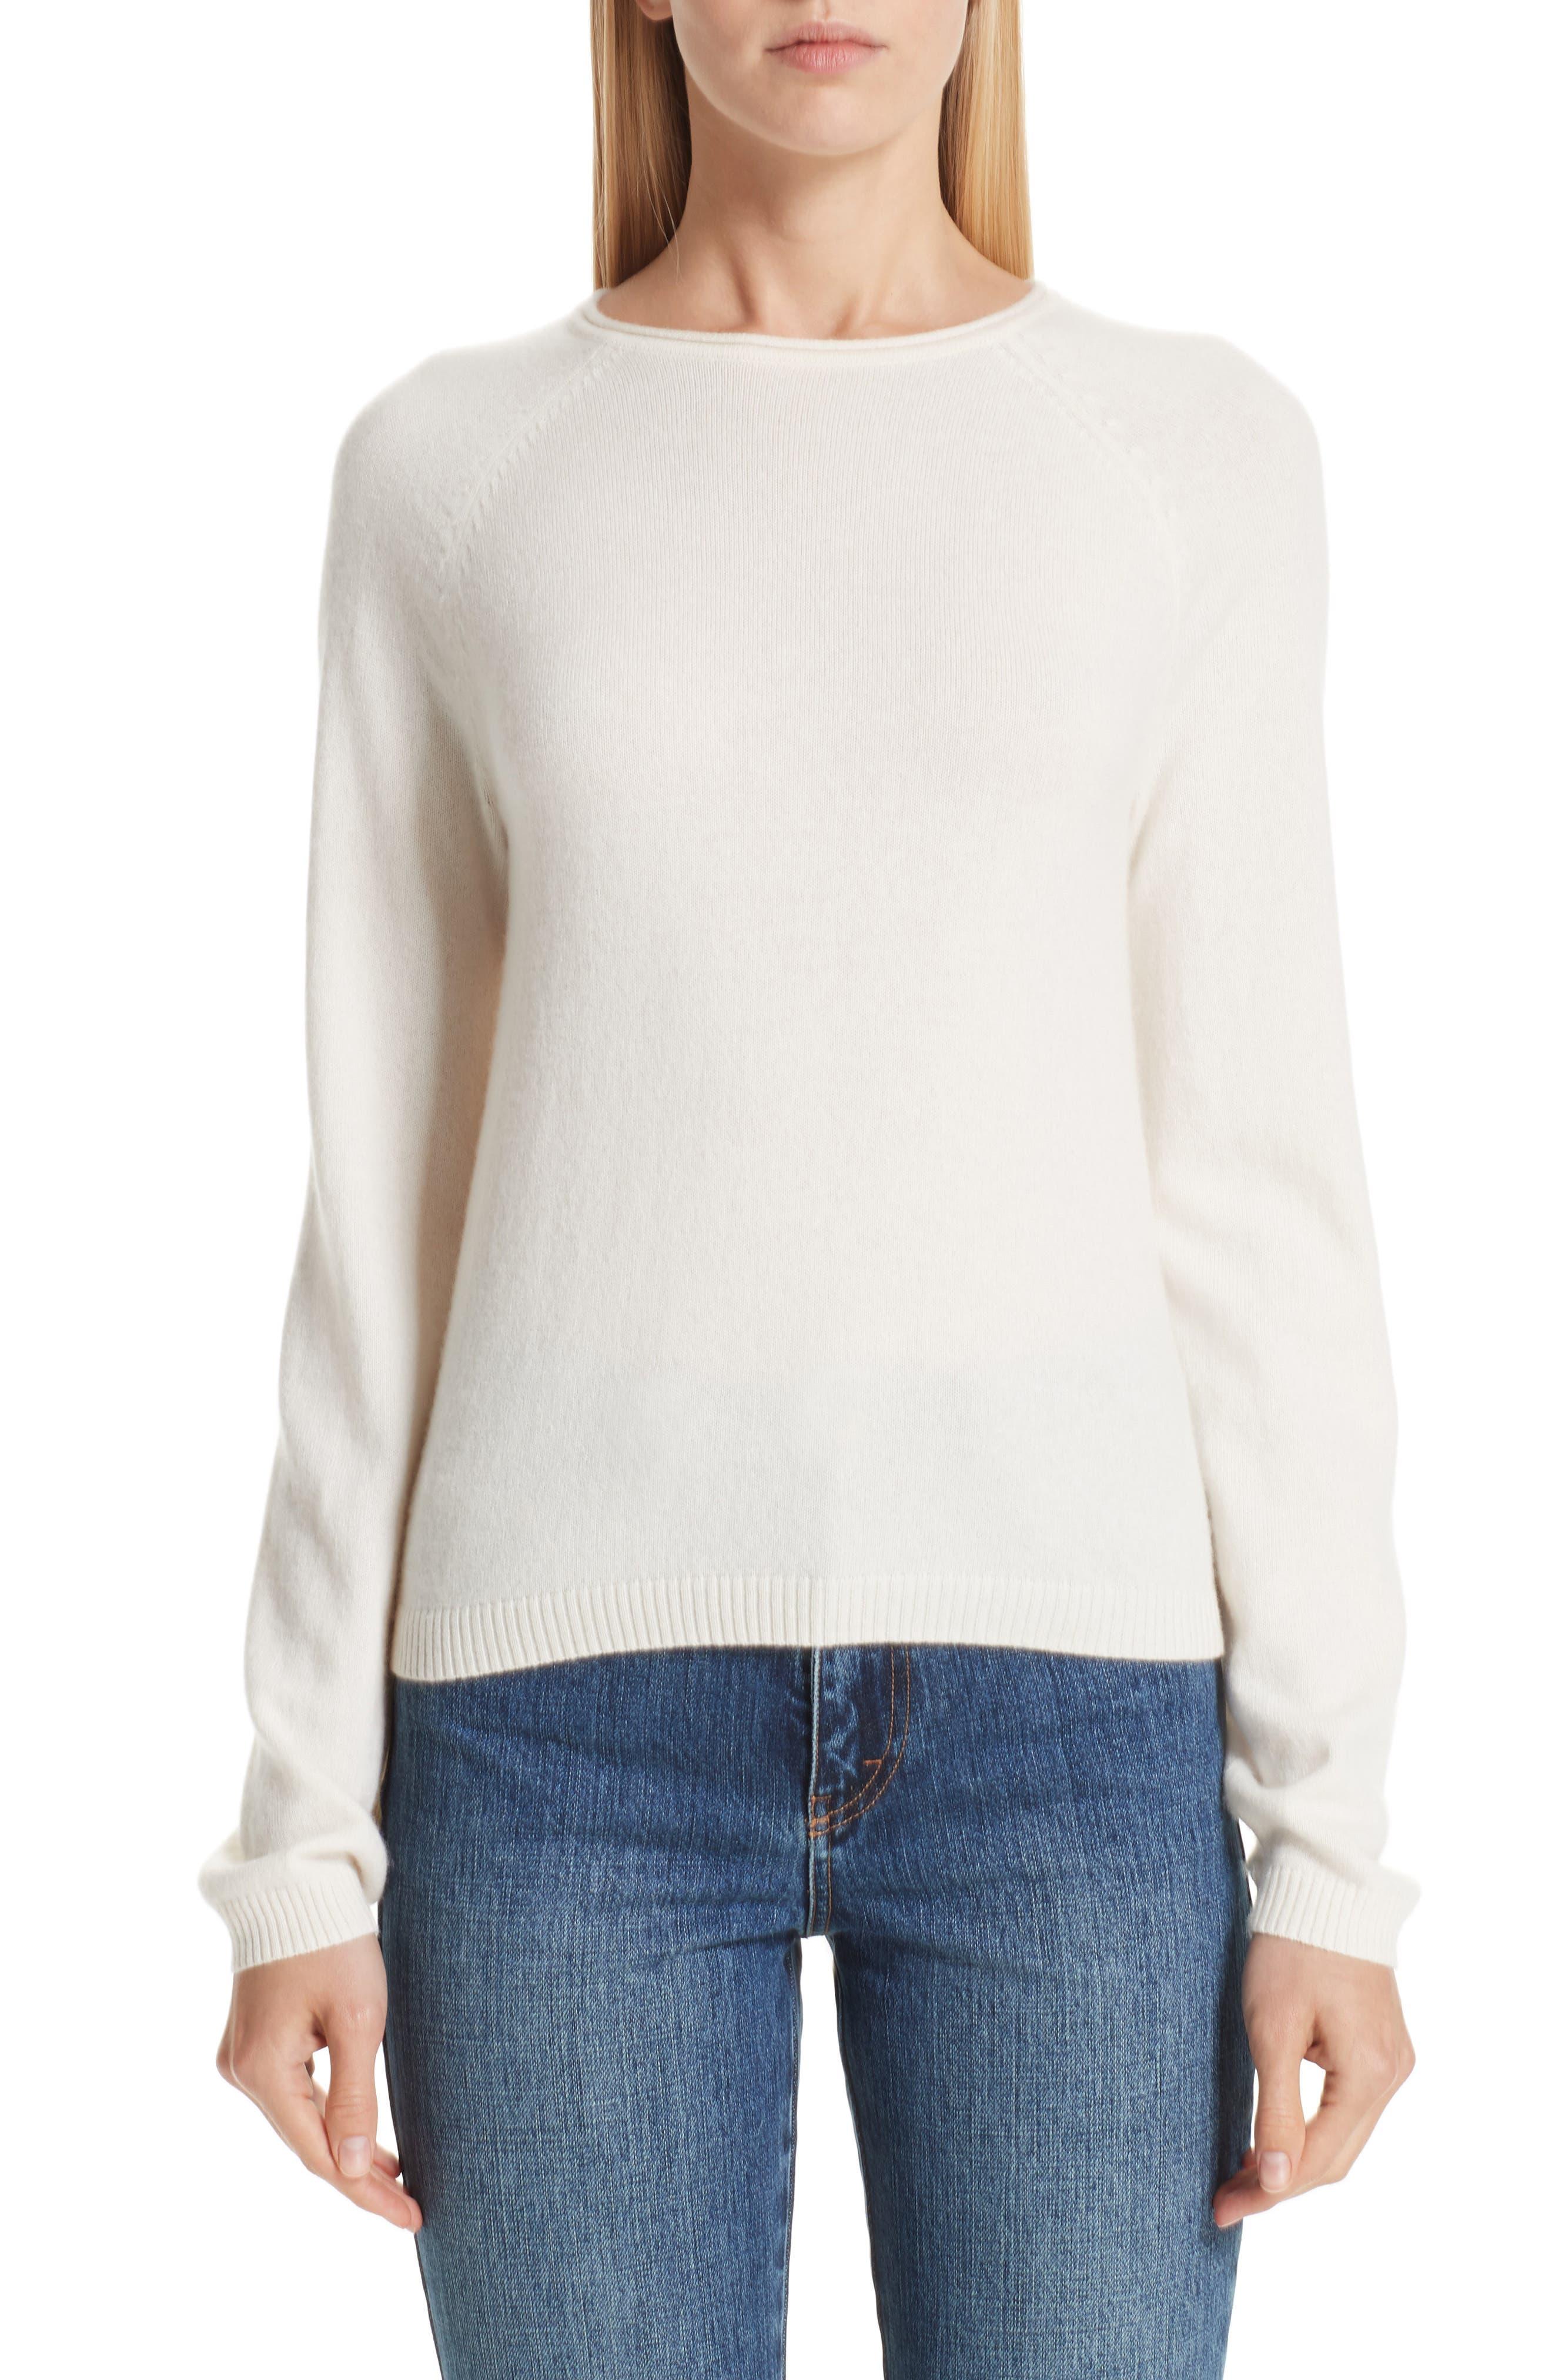 Co Silk Blend Raglan Sweater, Ivory